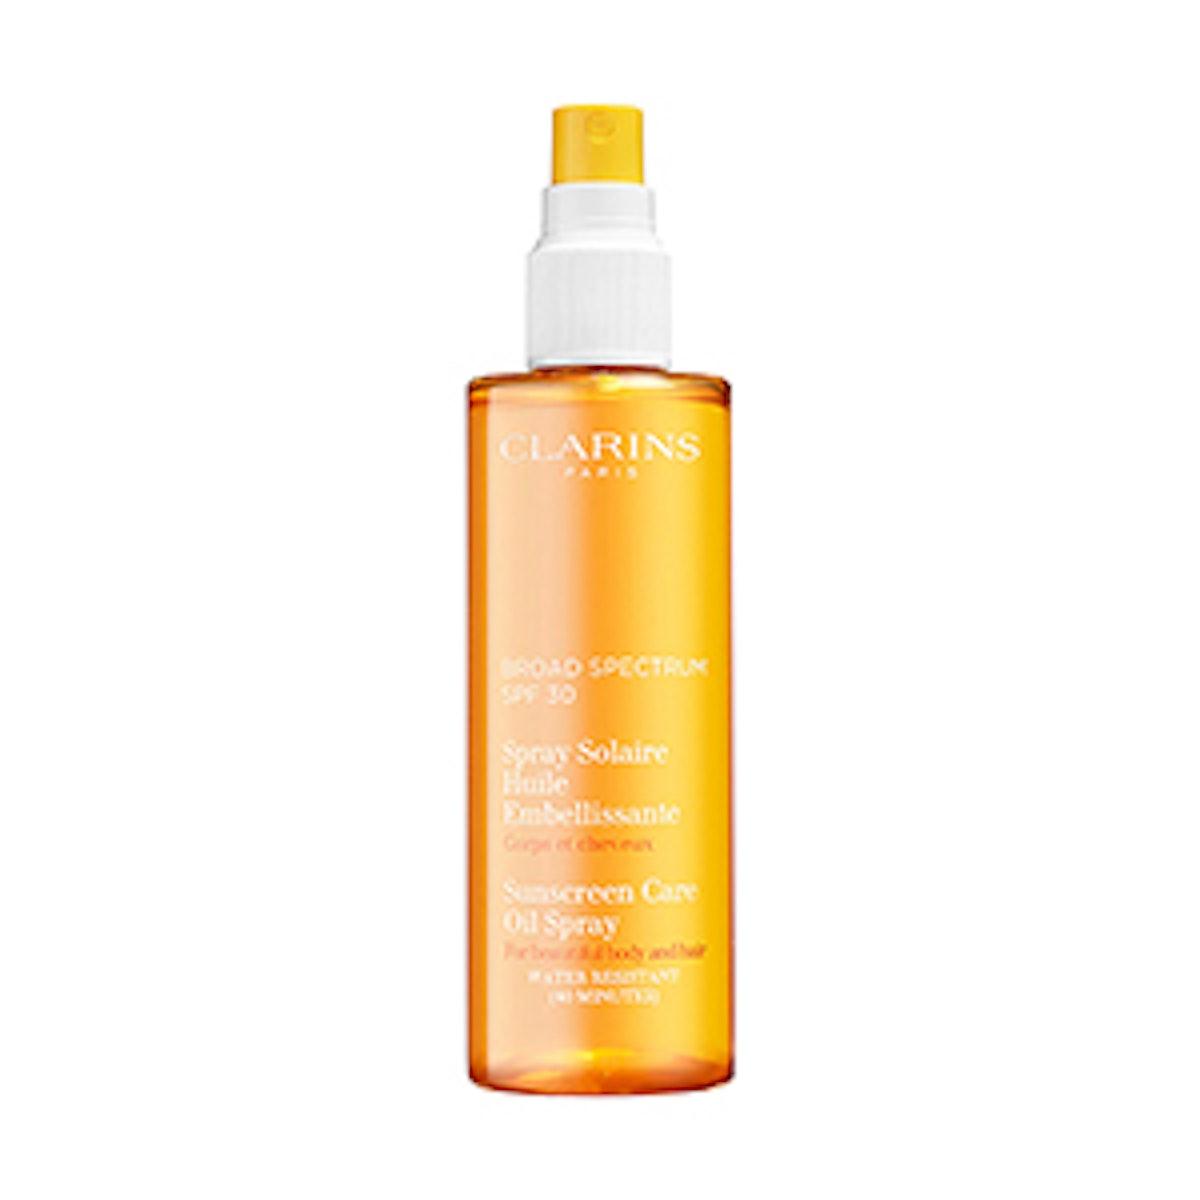 Sunscreen Care Oil Spray Broad Spectrum SPF 30